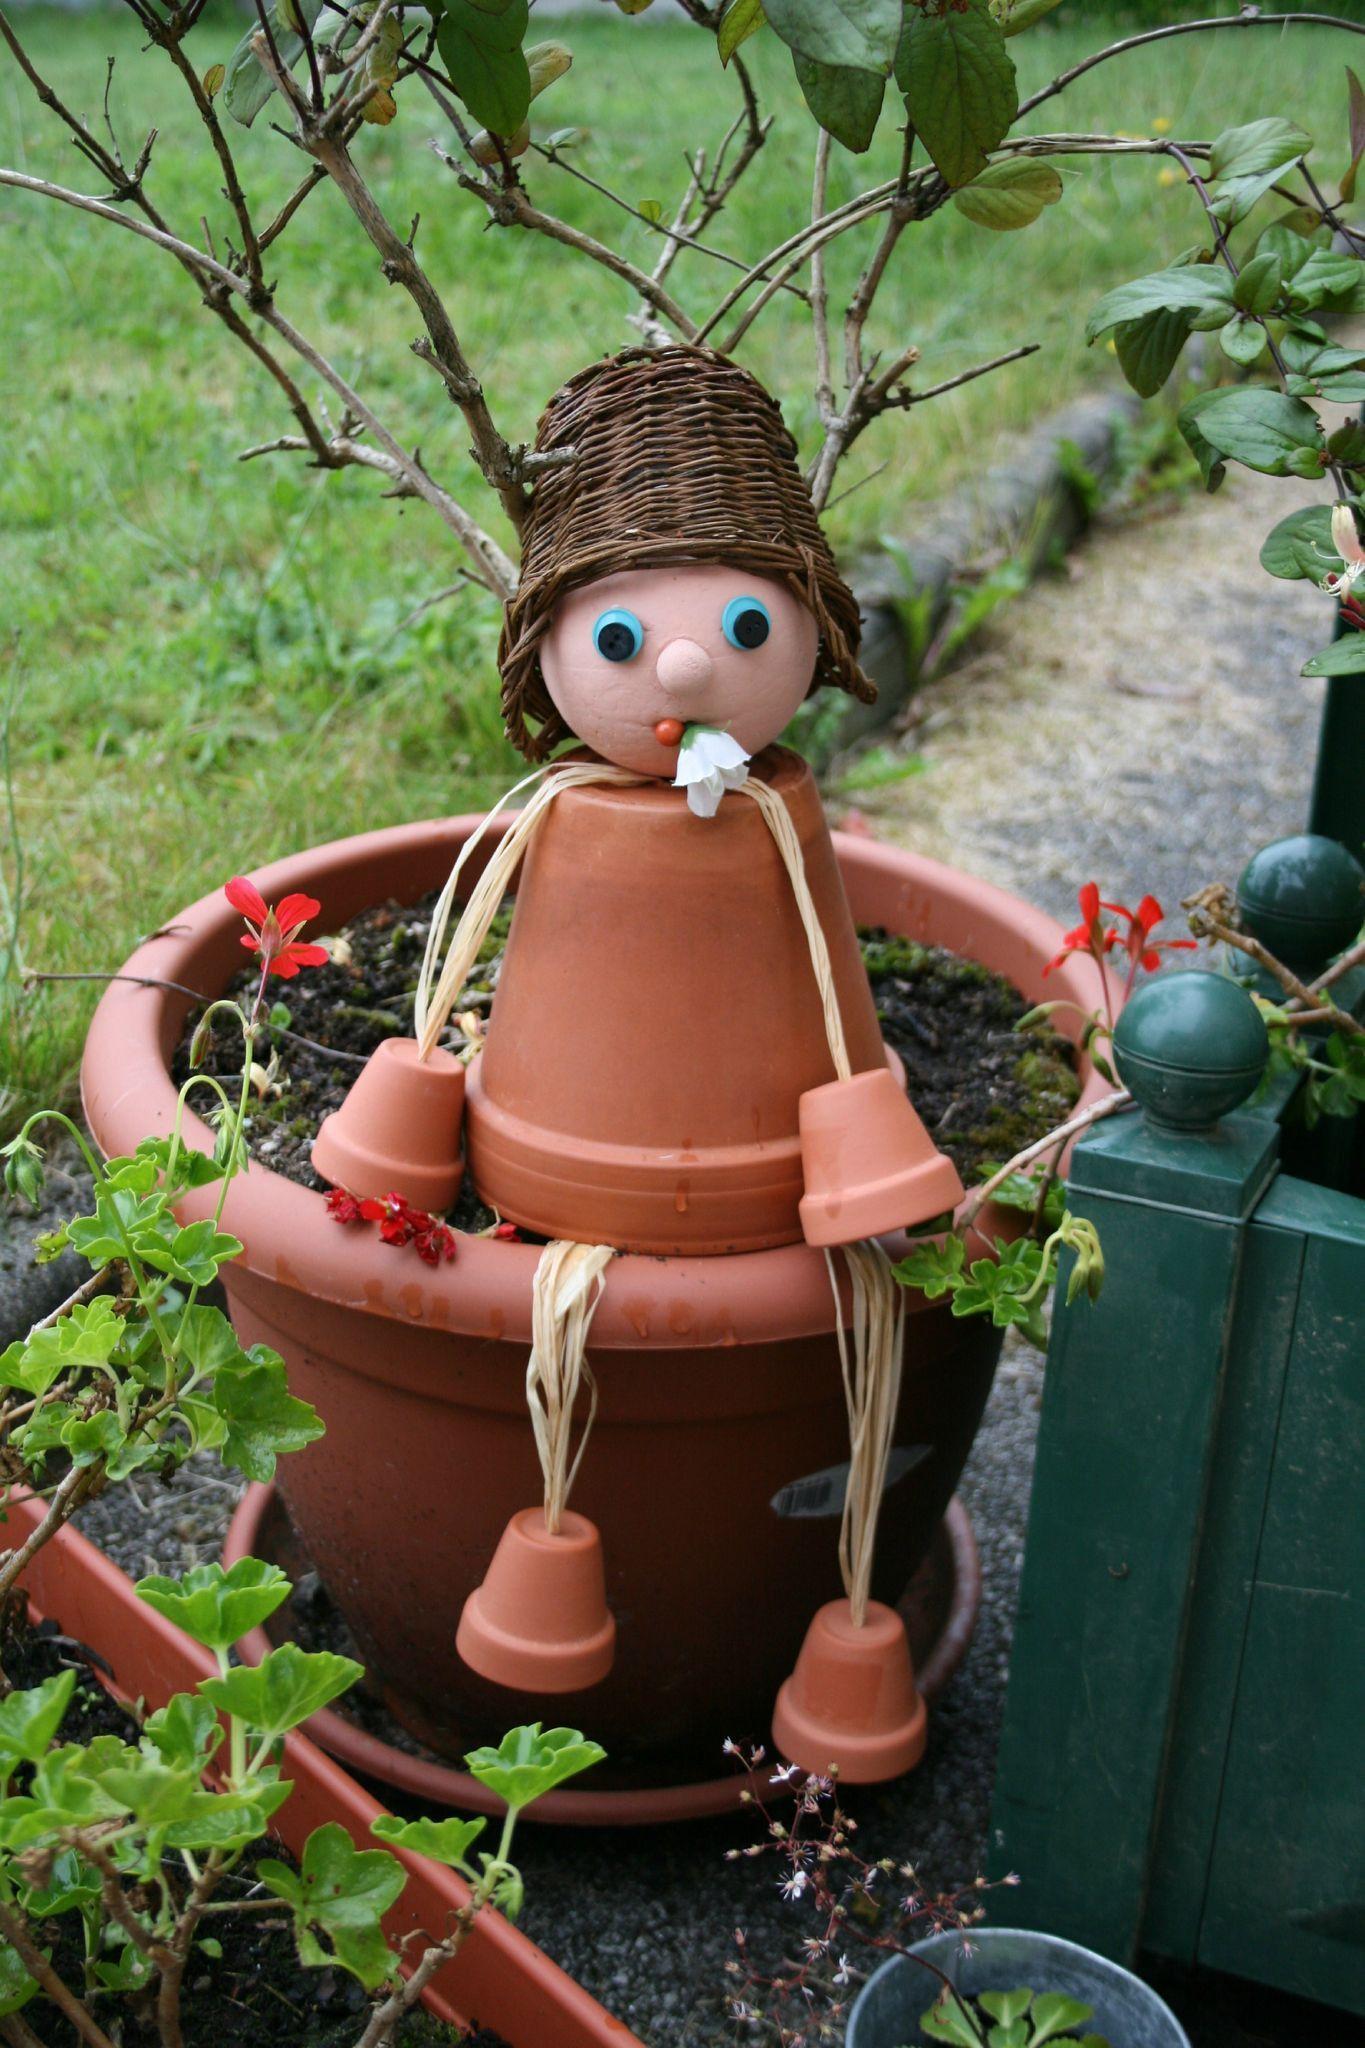 Personnage Pot De Fleur Artesanato De Natal Bolsa De Mao De Croche Placas Para Jardim